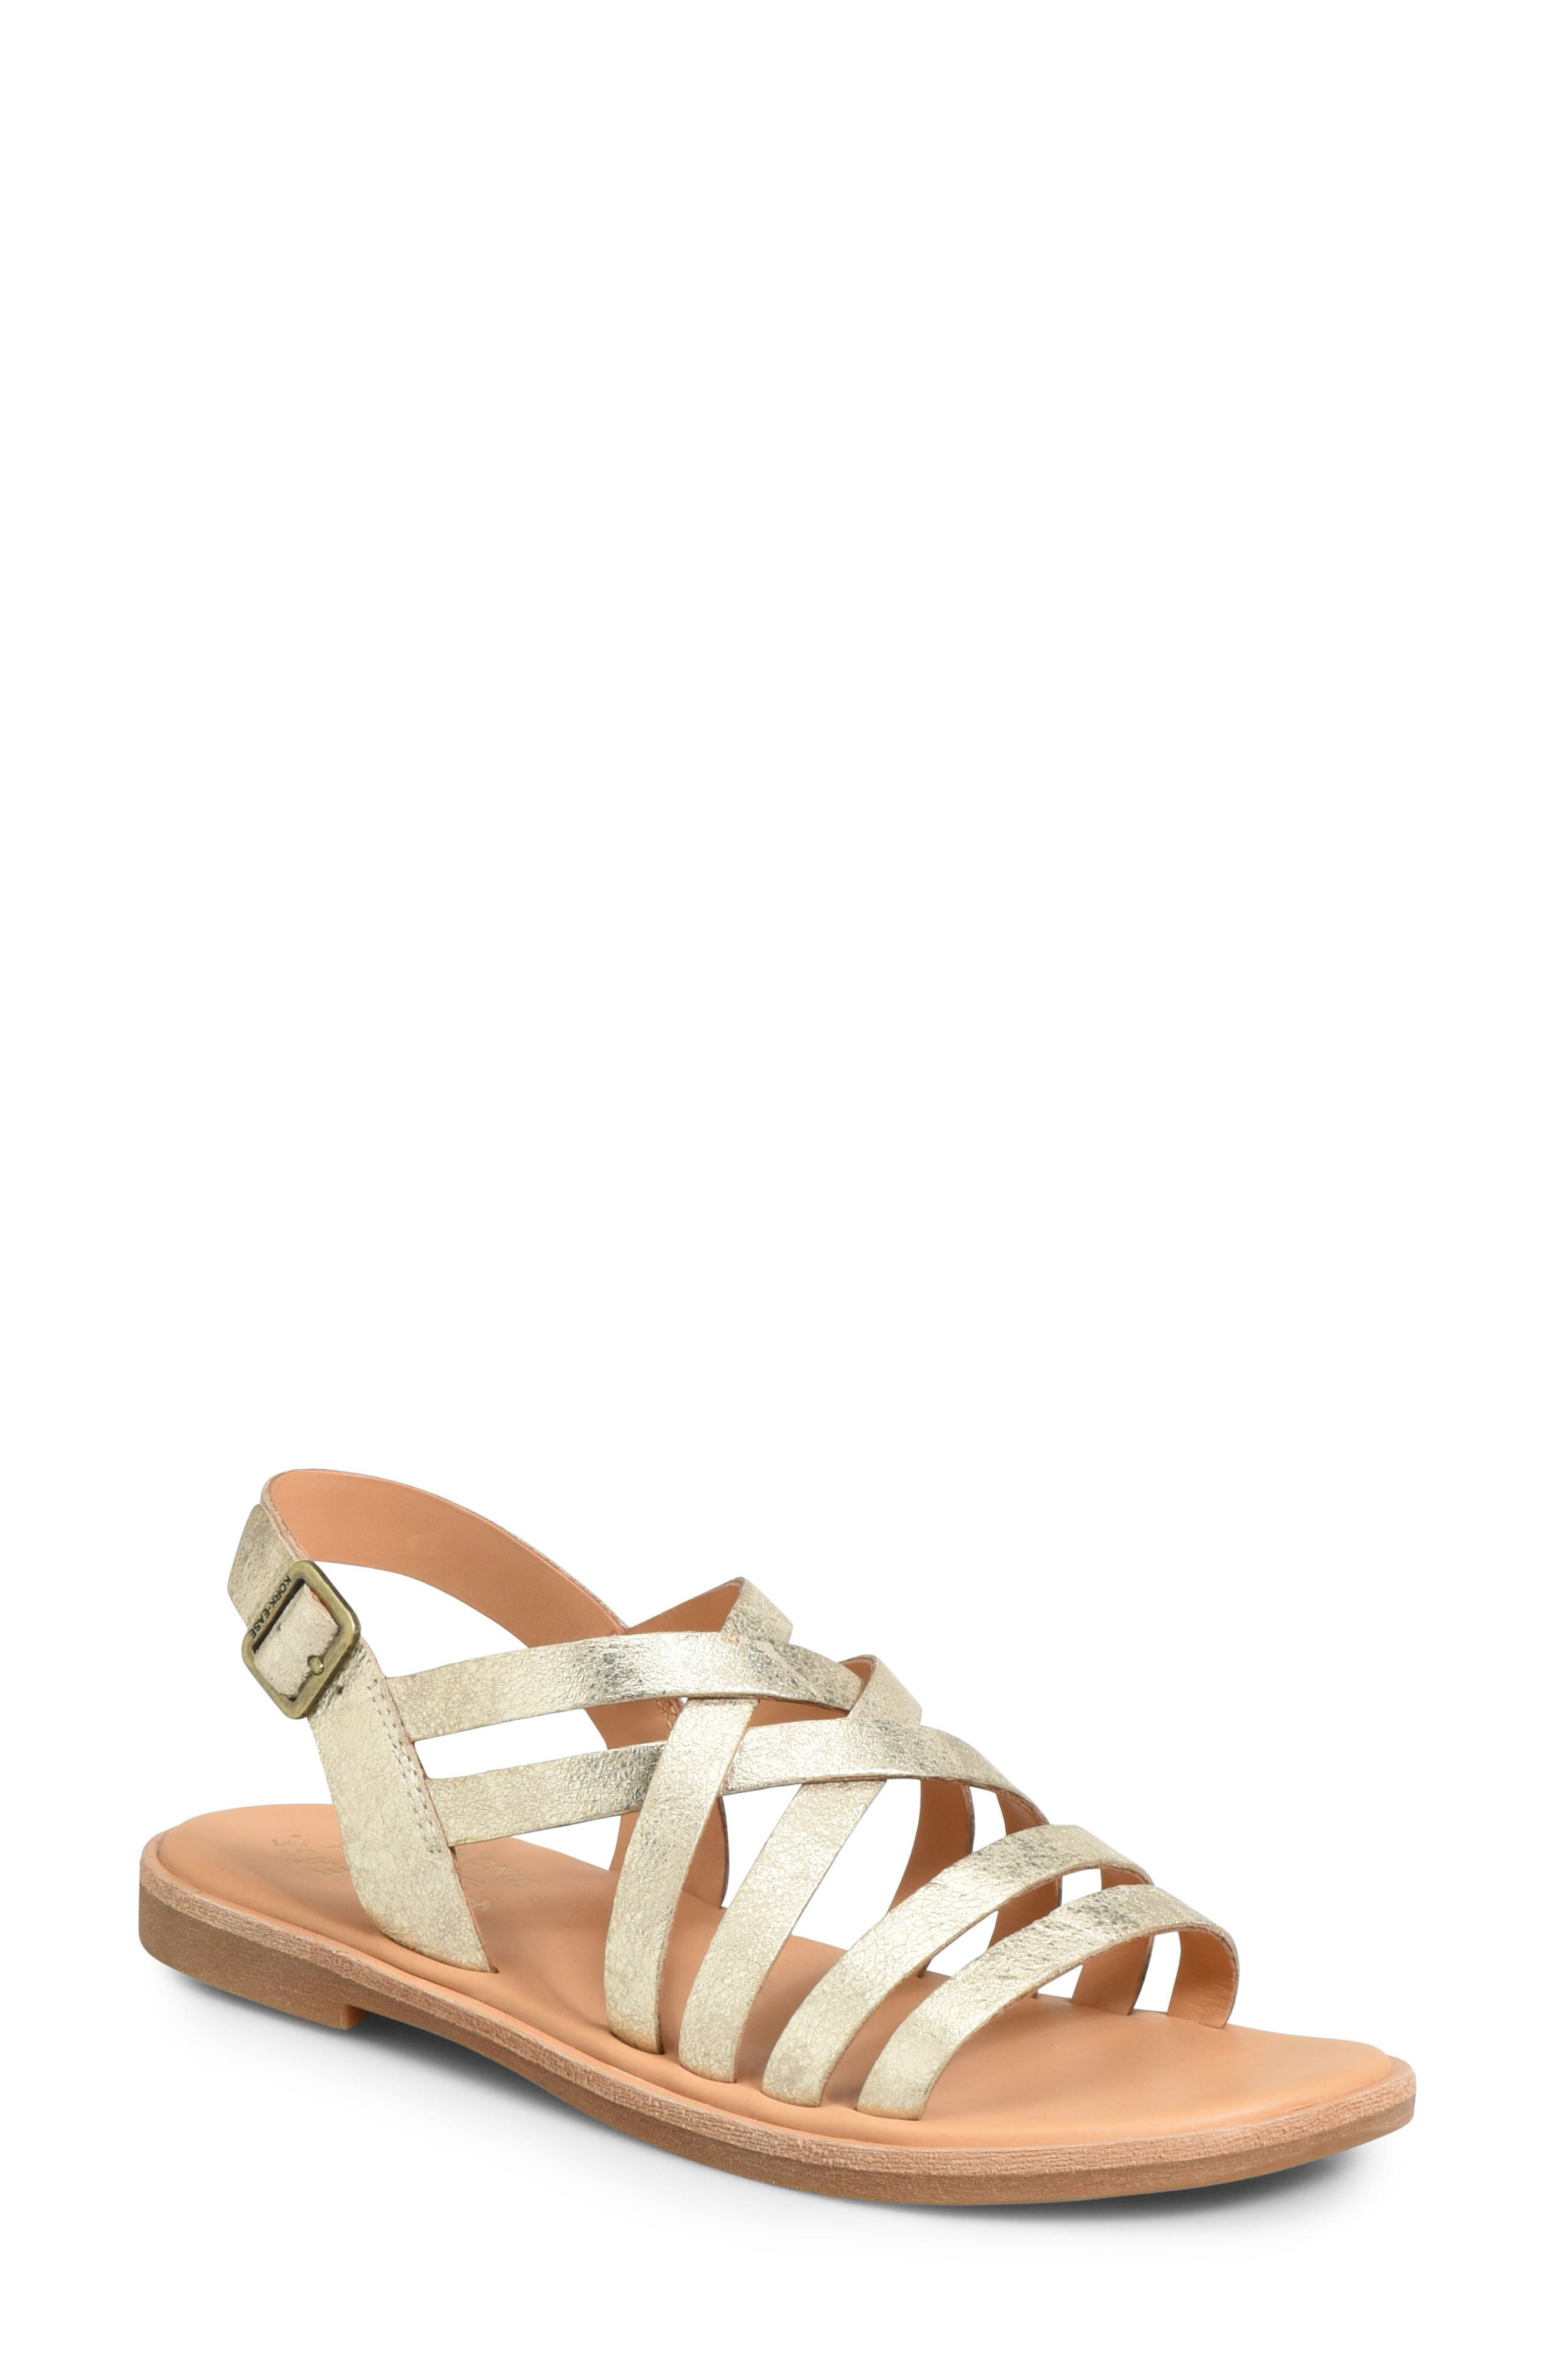 Nicobar Sandal,                         Main,                         color, Gold Metallic Leather